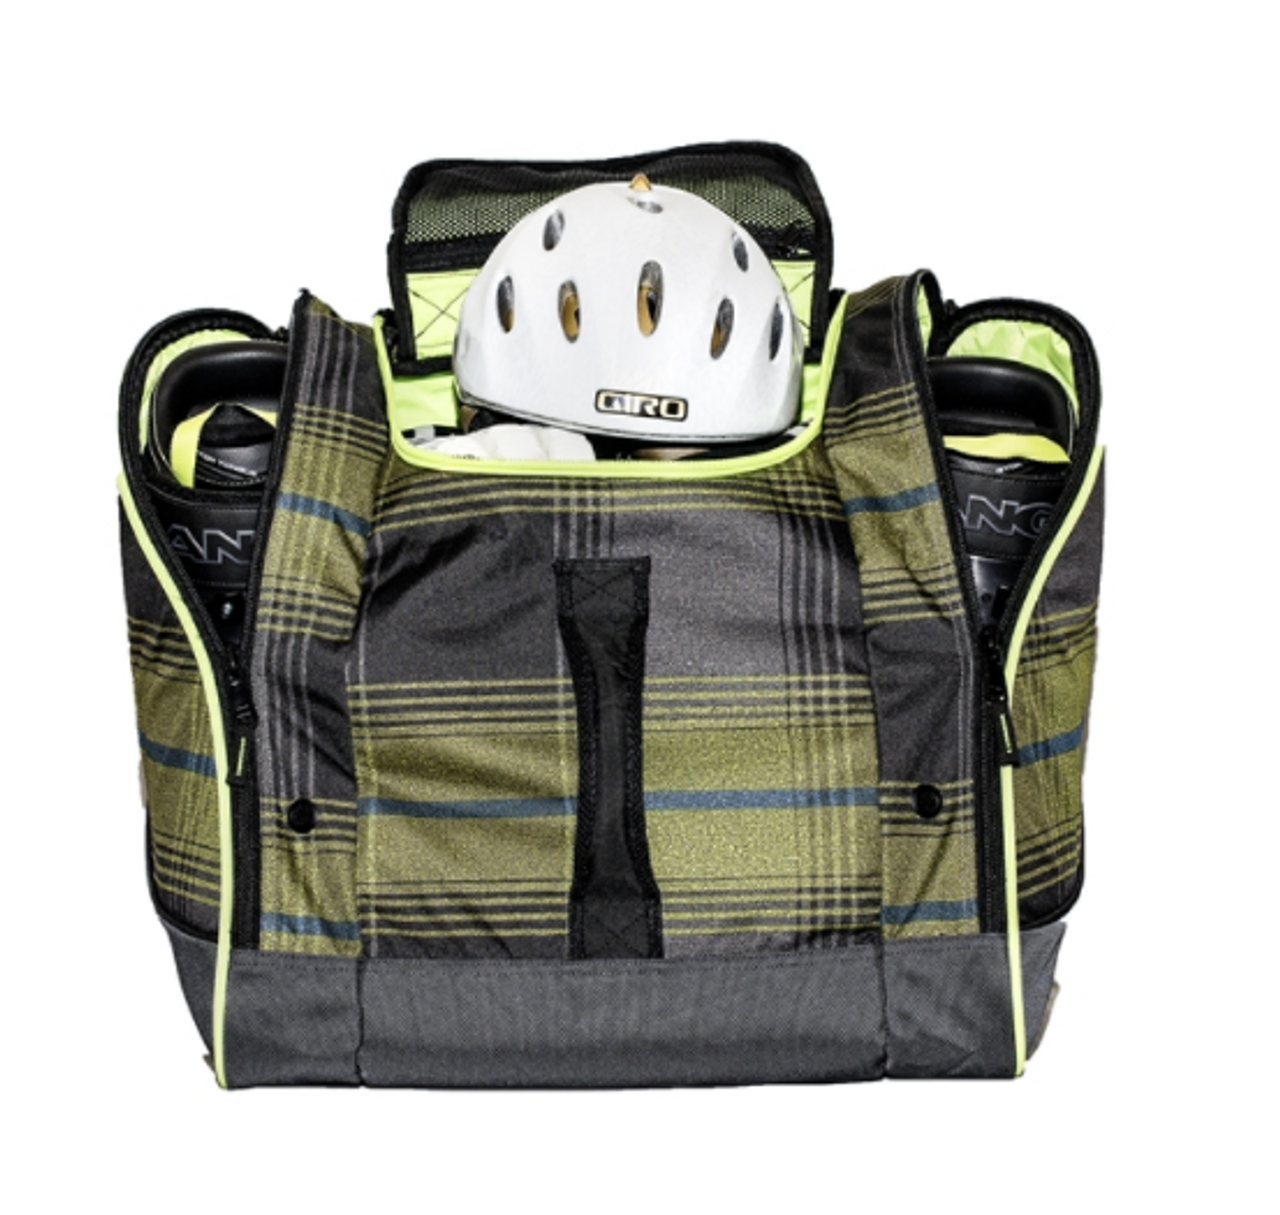 Ski Boot and Gear Bag   70 Liters   Sportube - StoreYourBoard.com b92b363e88